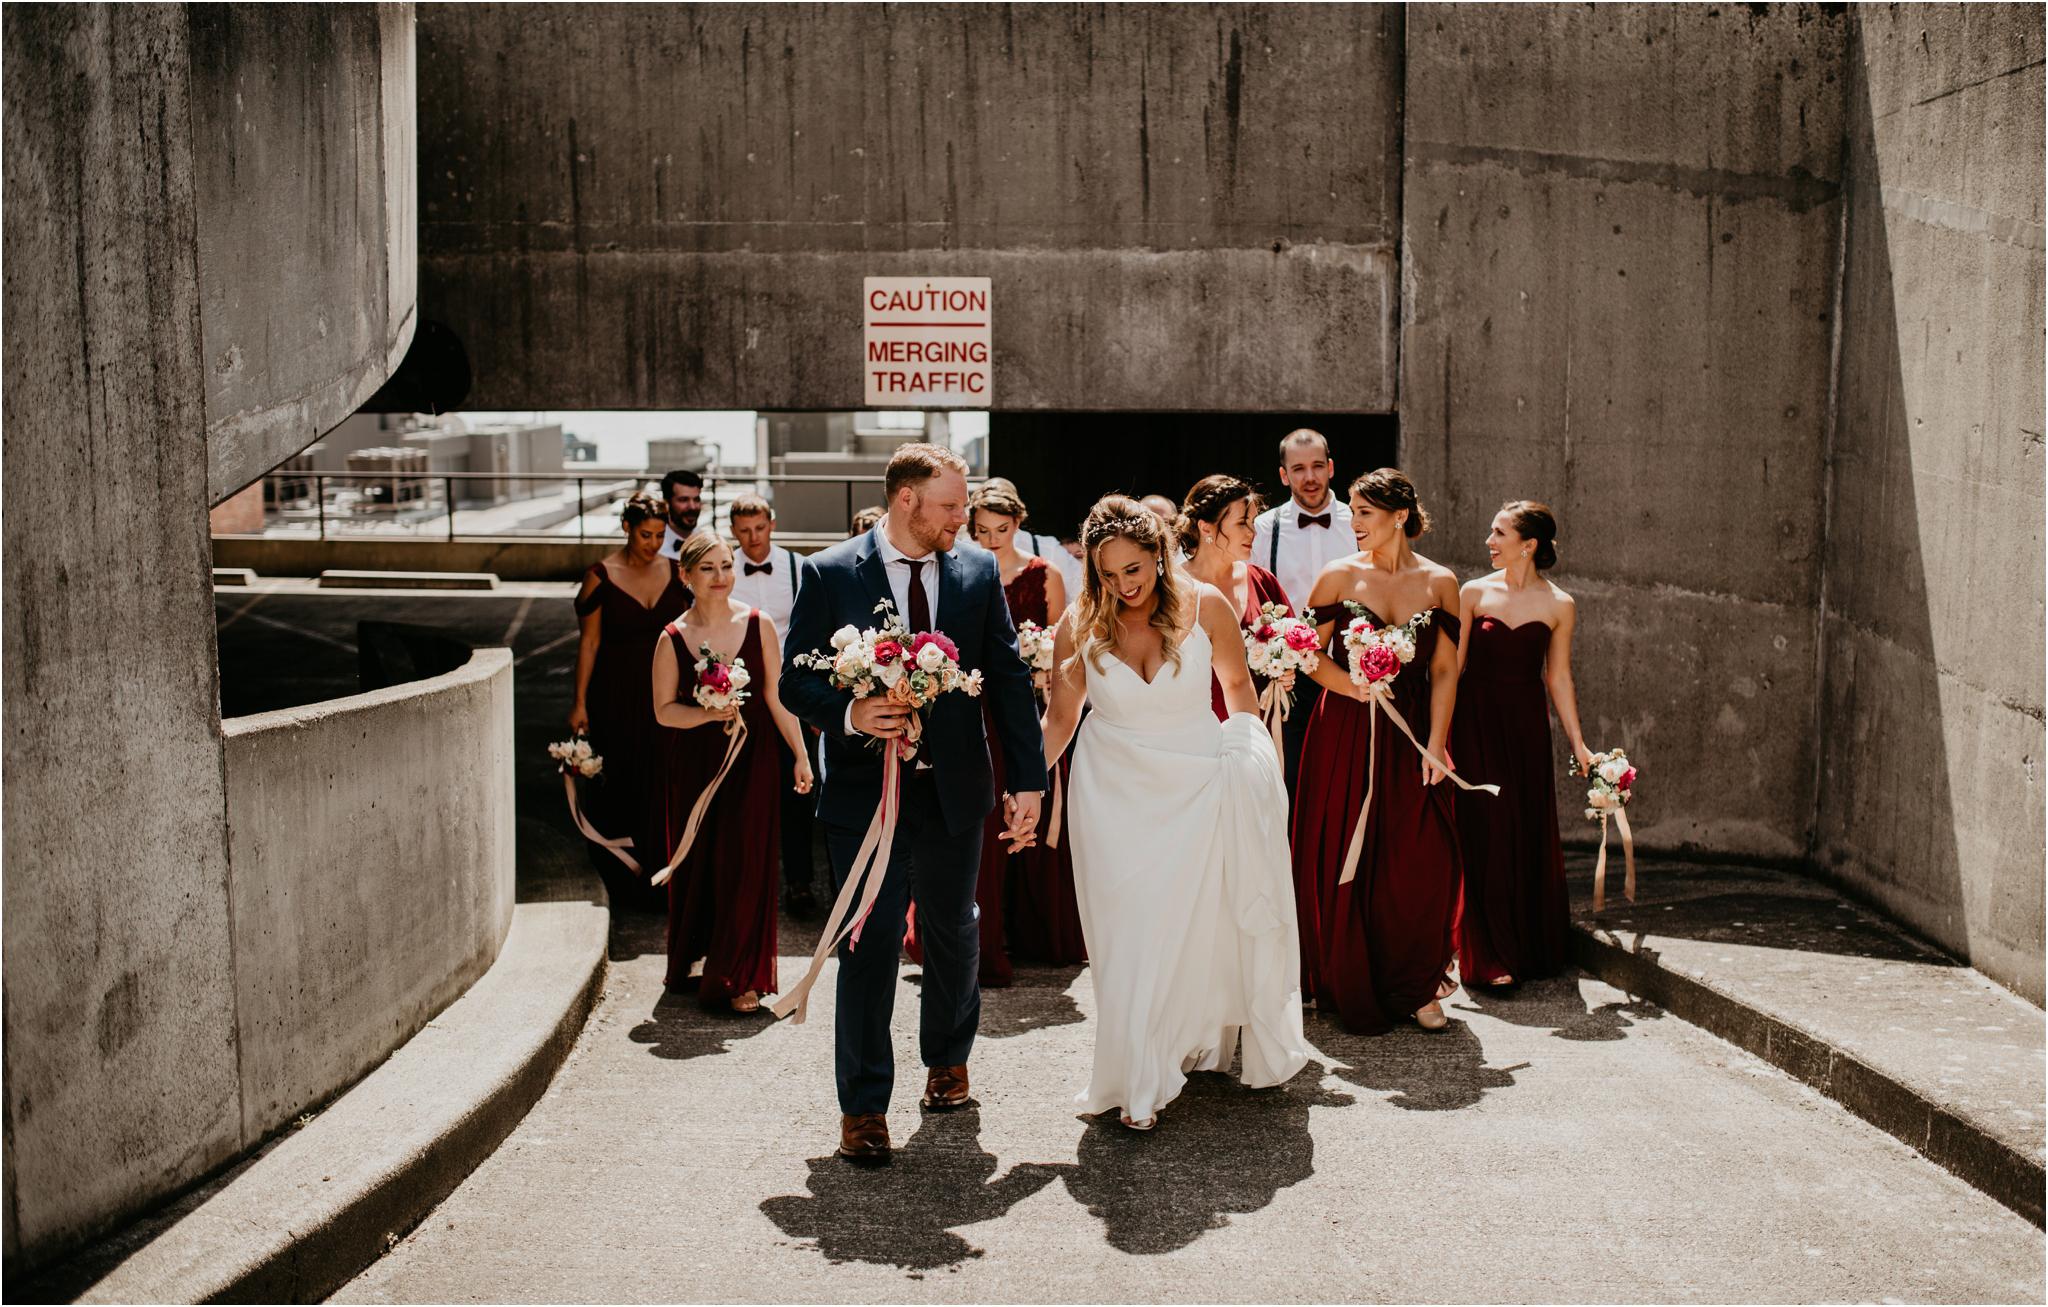 laura-and-matt-metropolist-urban-seattle-wedding-photographer-047.jpg